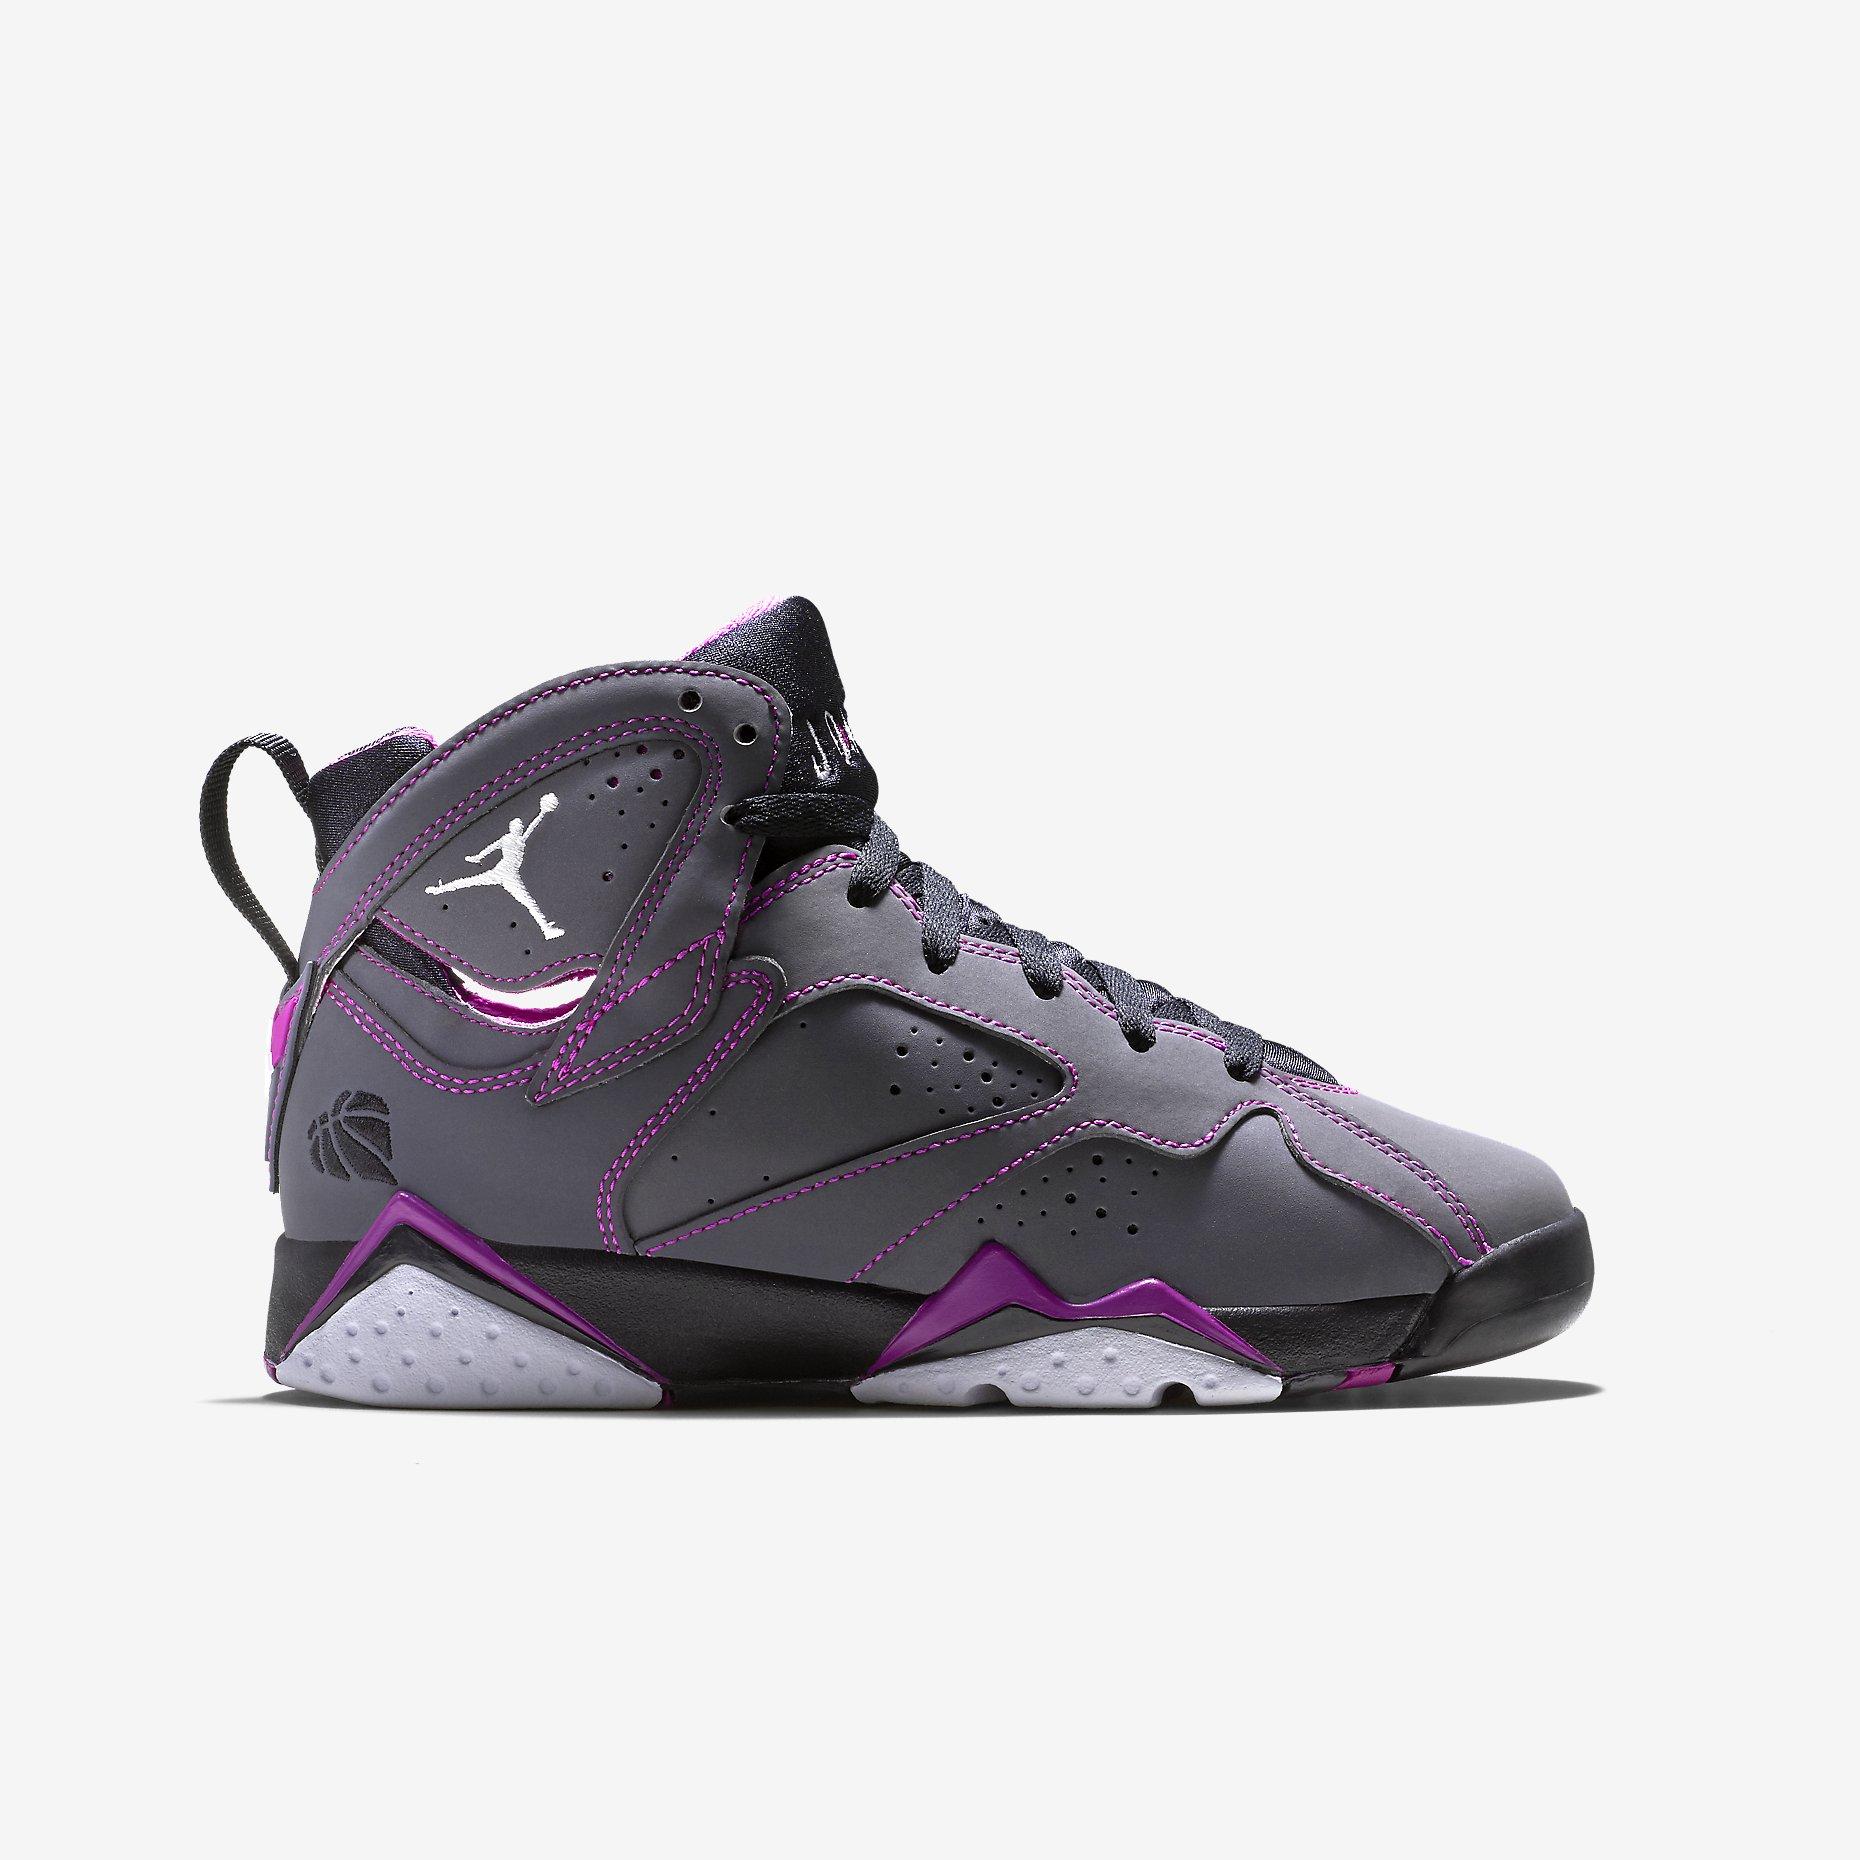 online retailer 3f8d4 71ce3 Air 23 – Air Jordan Release Dates, Foamposite, Air Max, and More